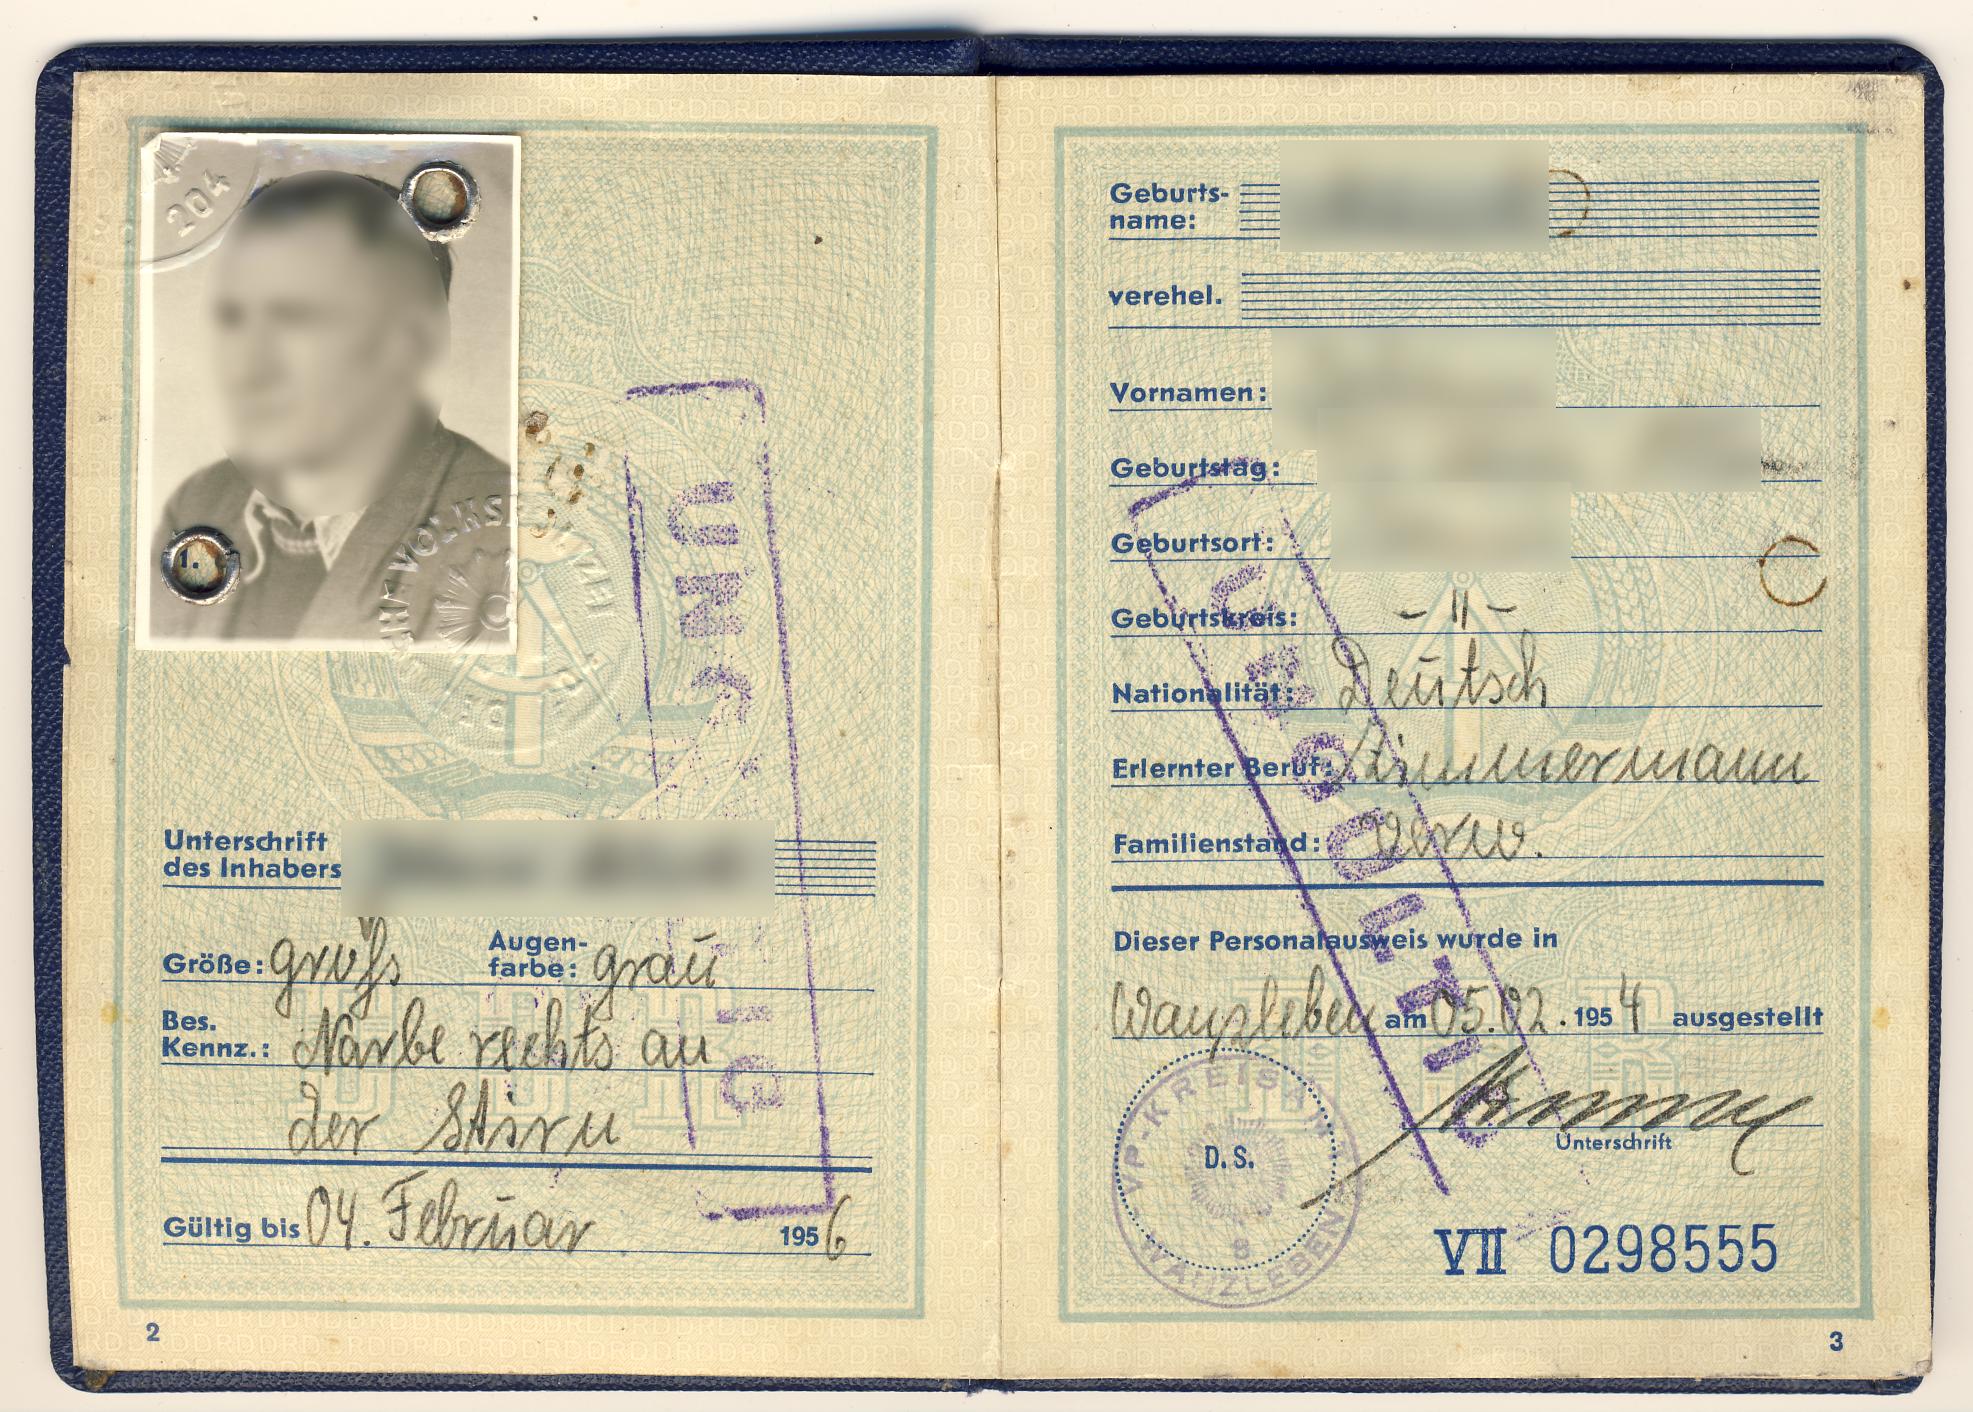 amsterdam australian convetion travel document